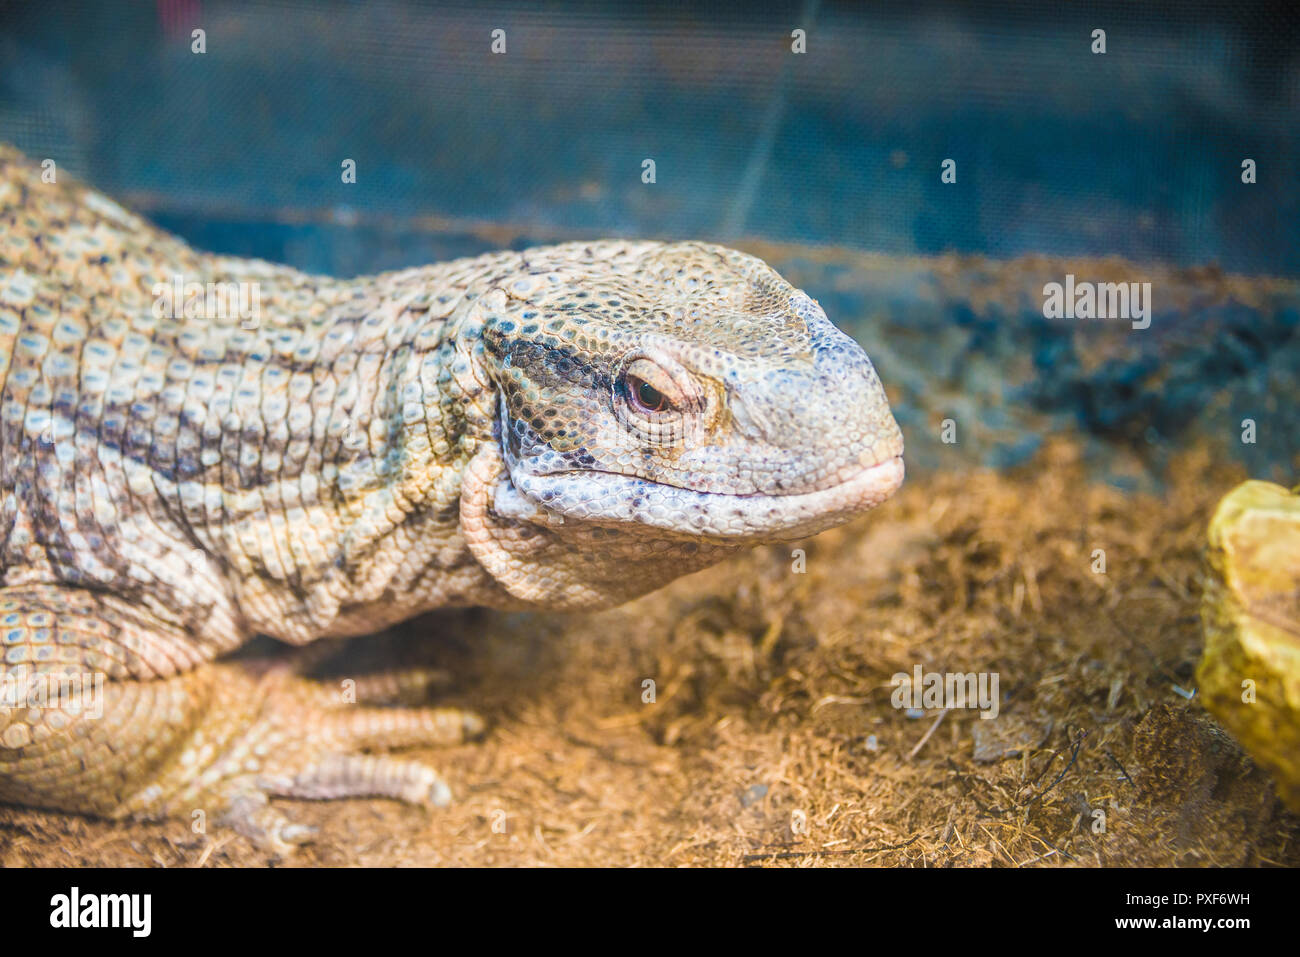 Varan close-up si trova nel giardino zoologico. Foto Stock